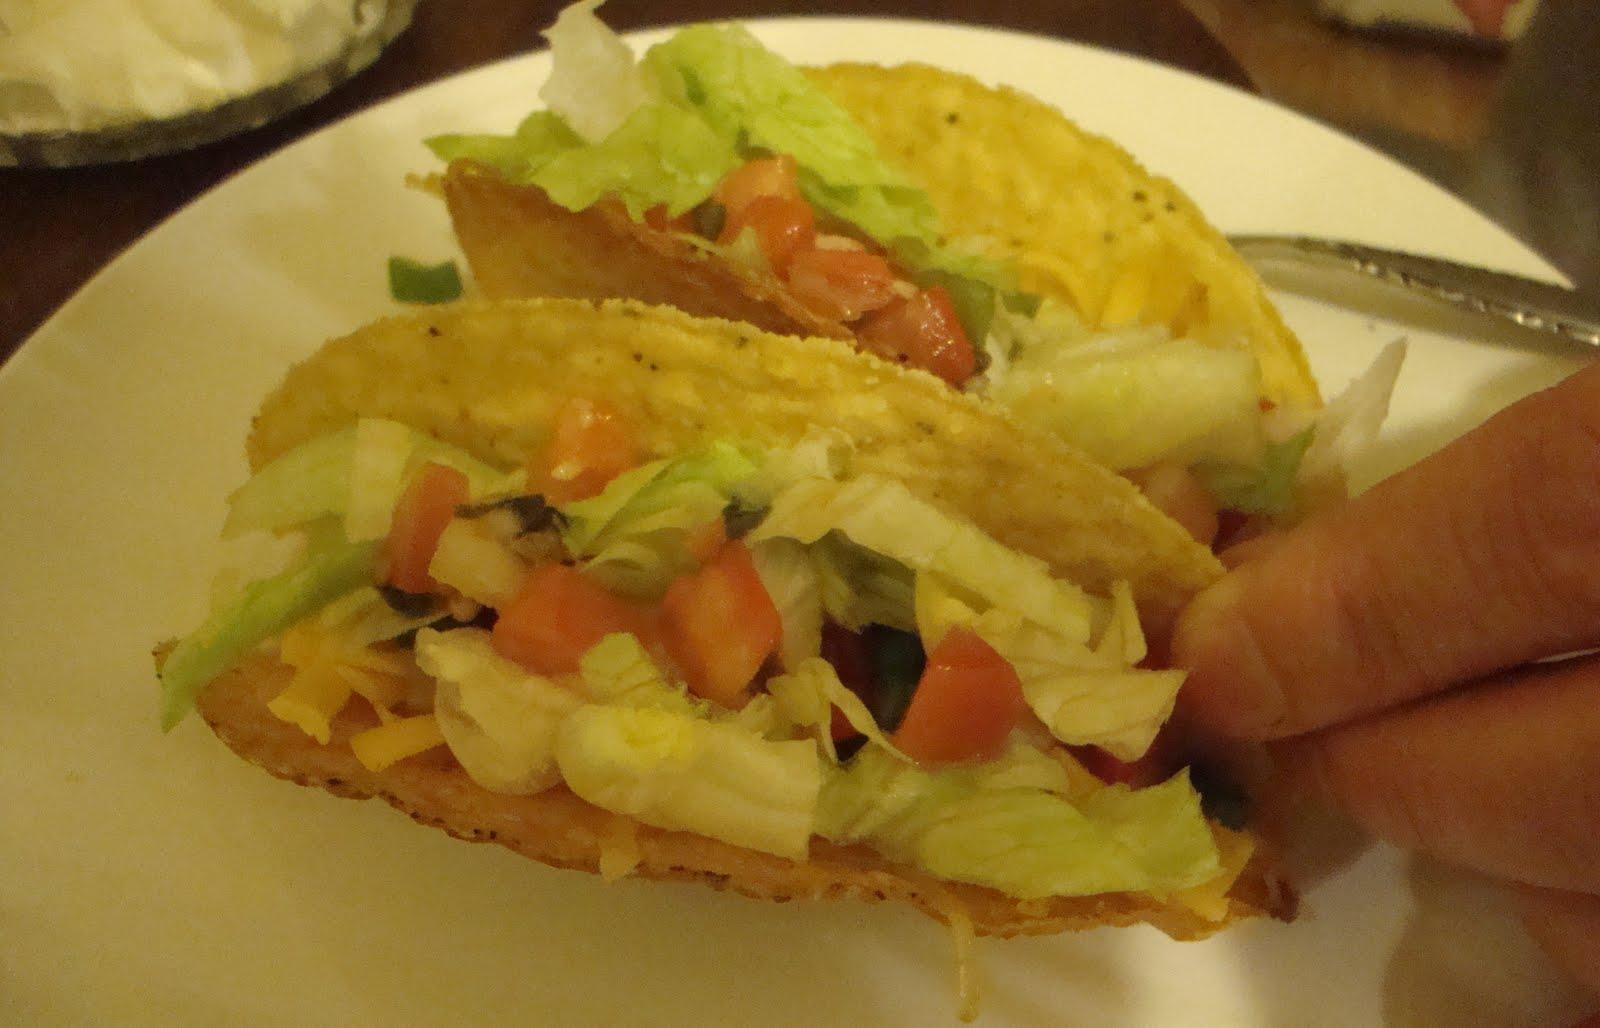 Food Floozie Icarly S Spaghetti Tacos Spaghetti Squash Tacos That Is